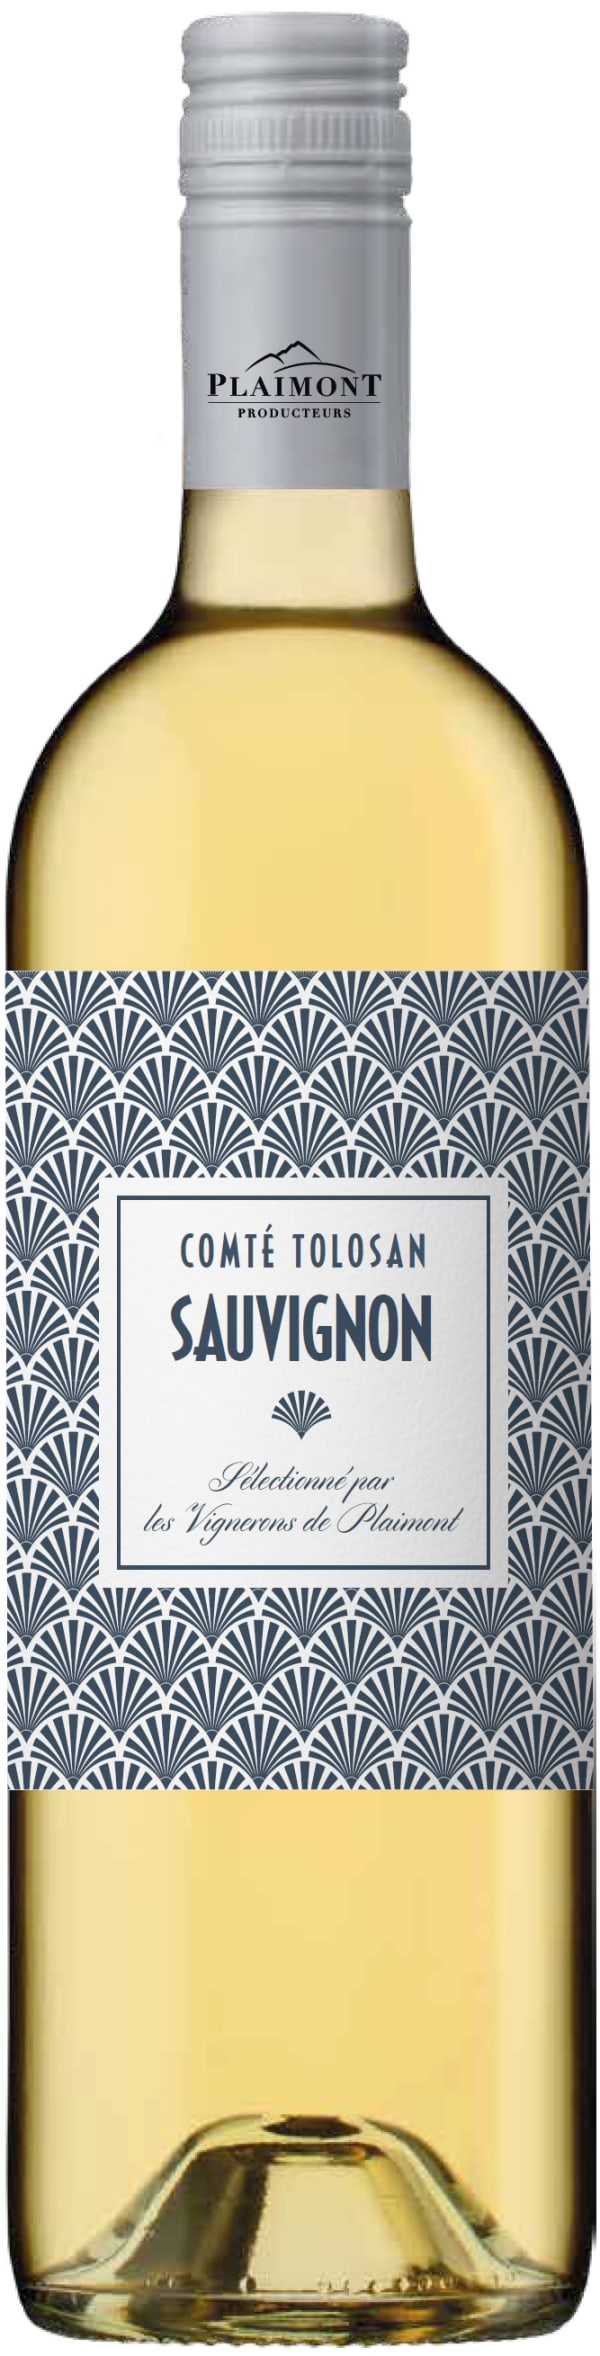 Plaimont Sauvignon 2016